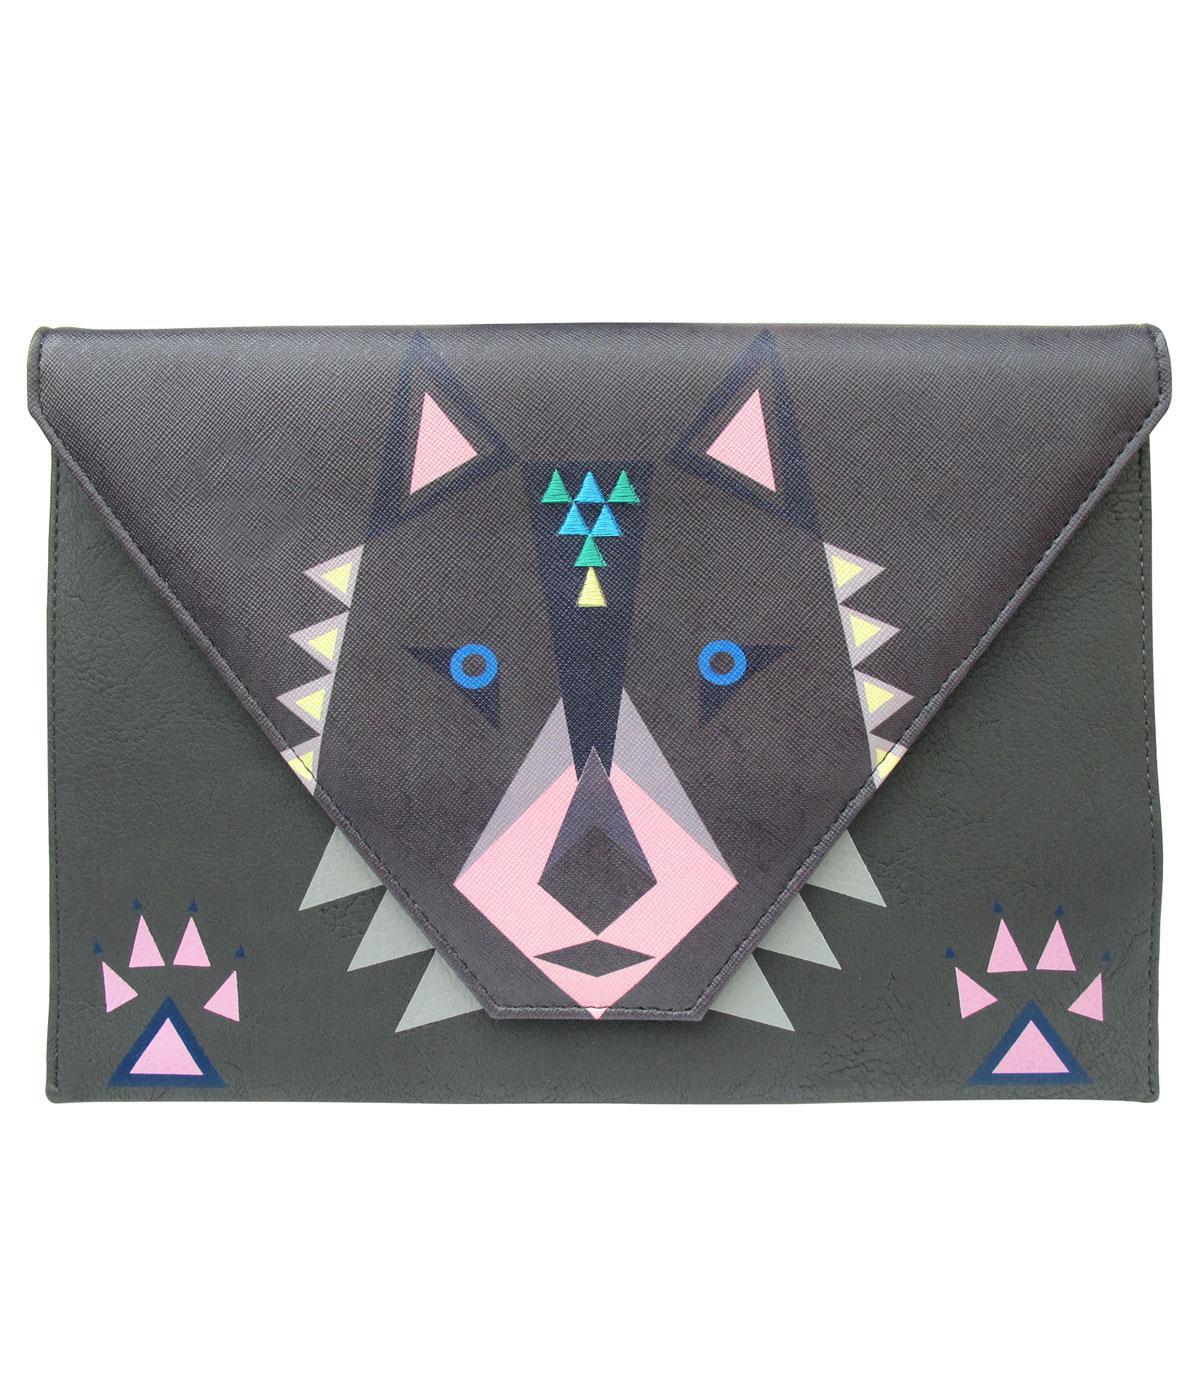 Dakota Wolf DISASTER DESIGNS 1960s Mod Clutch Bag